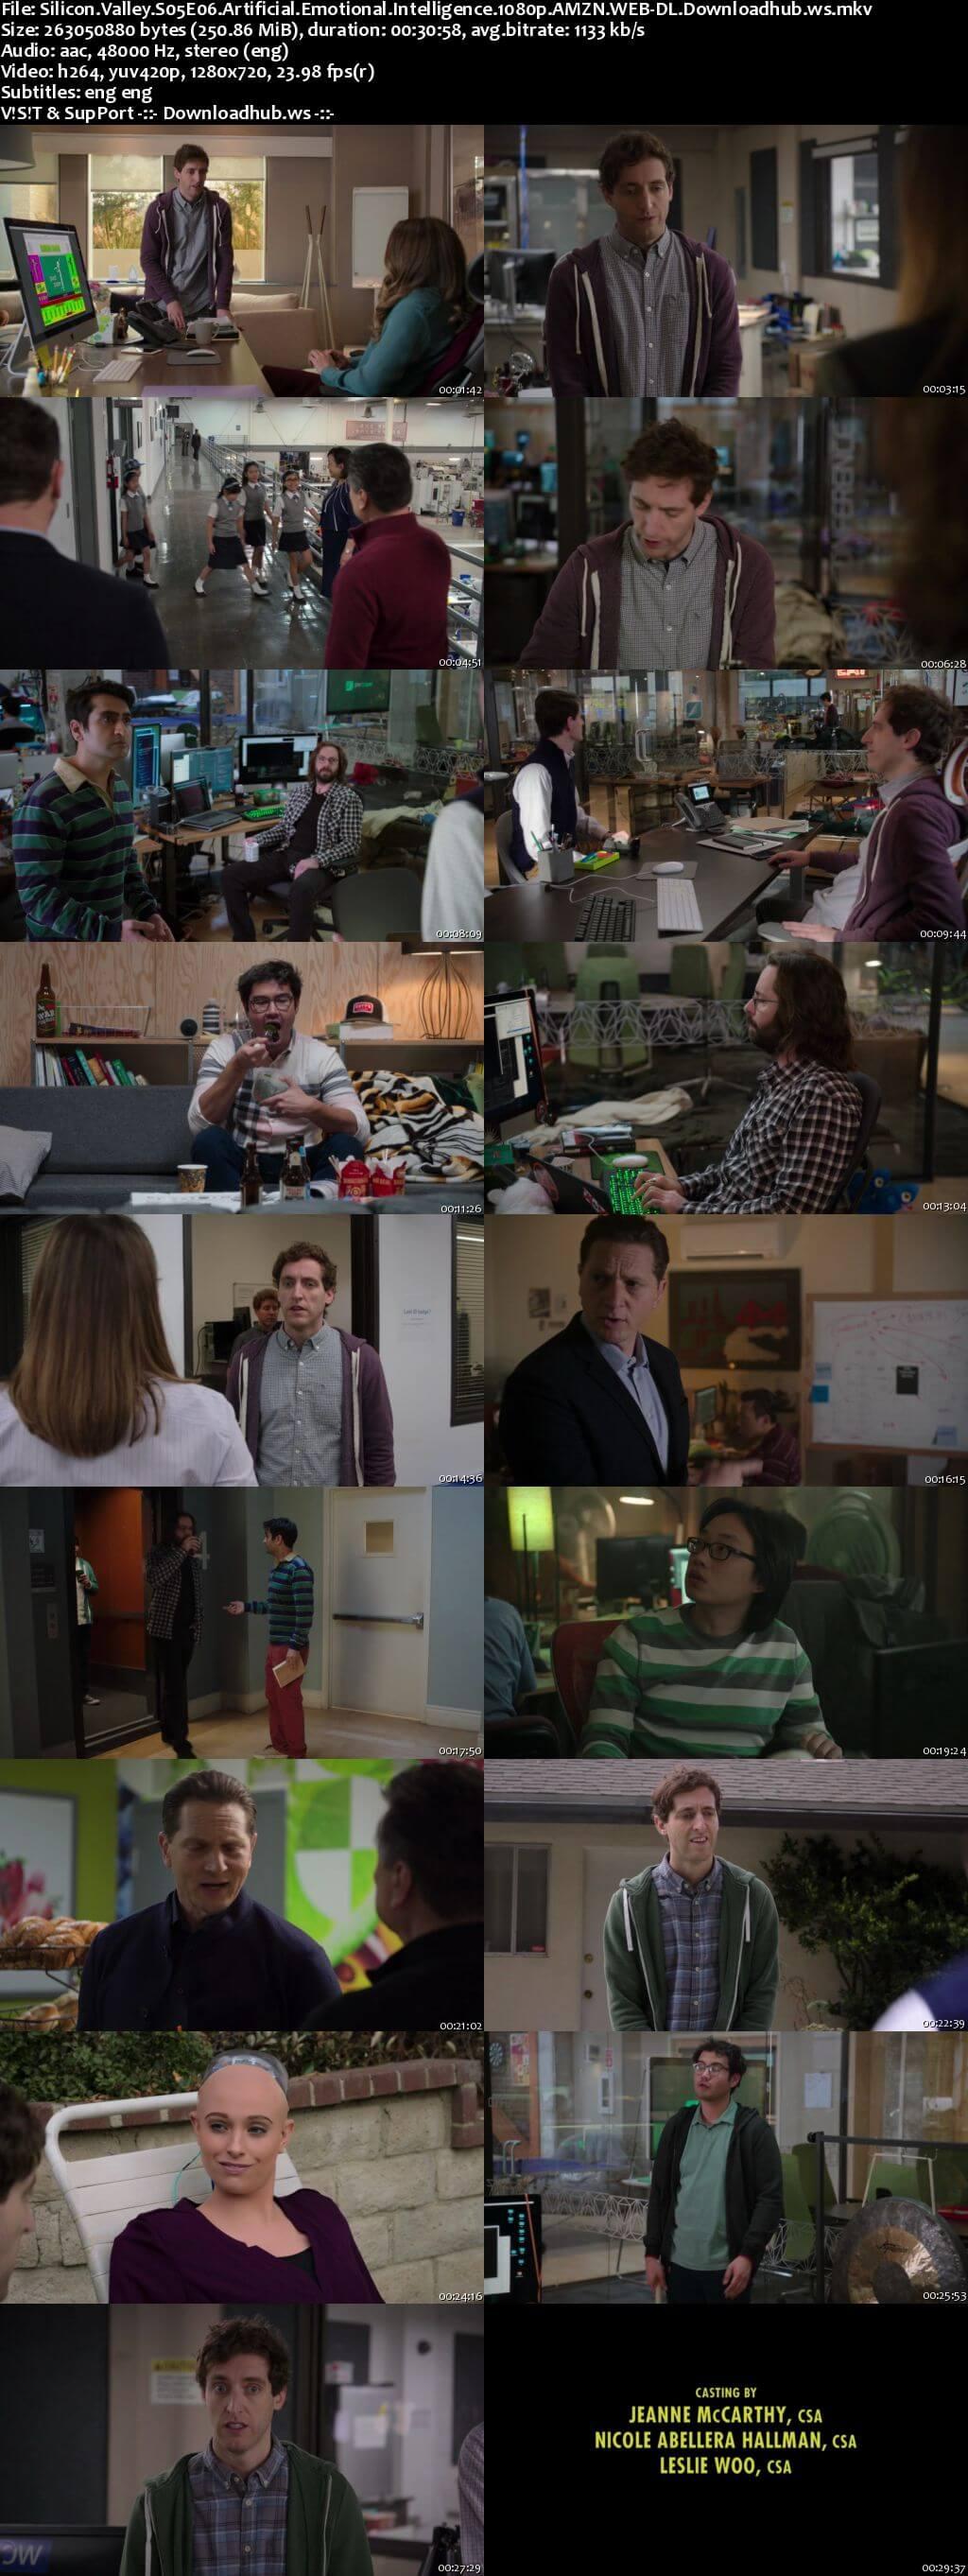 Silicon Valley S05E06 250MB WEBRip 720p x264